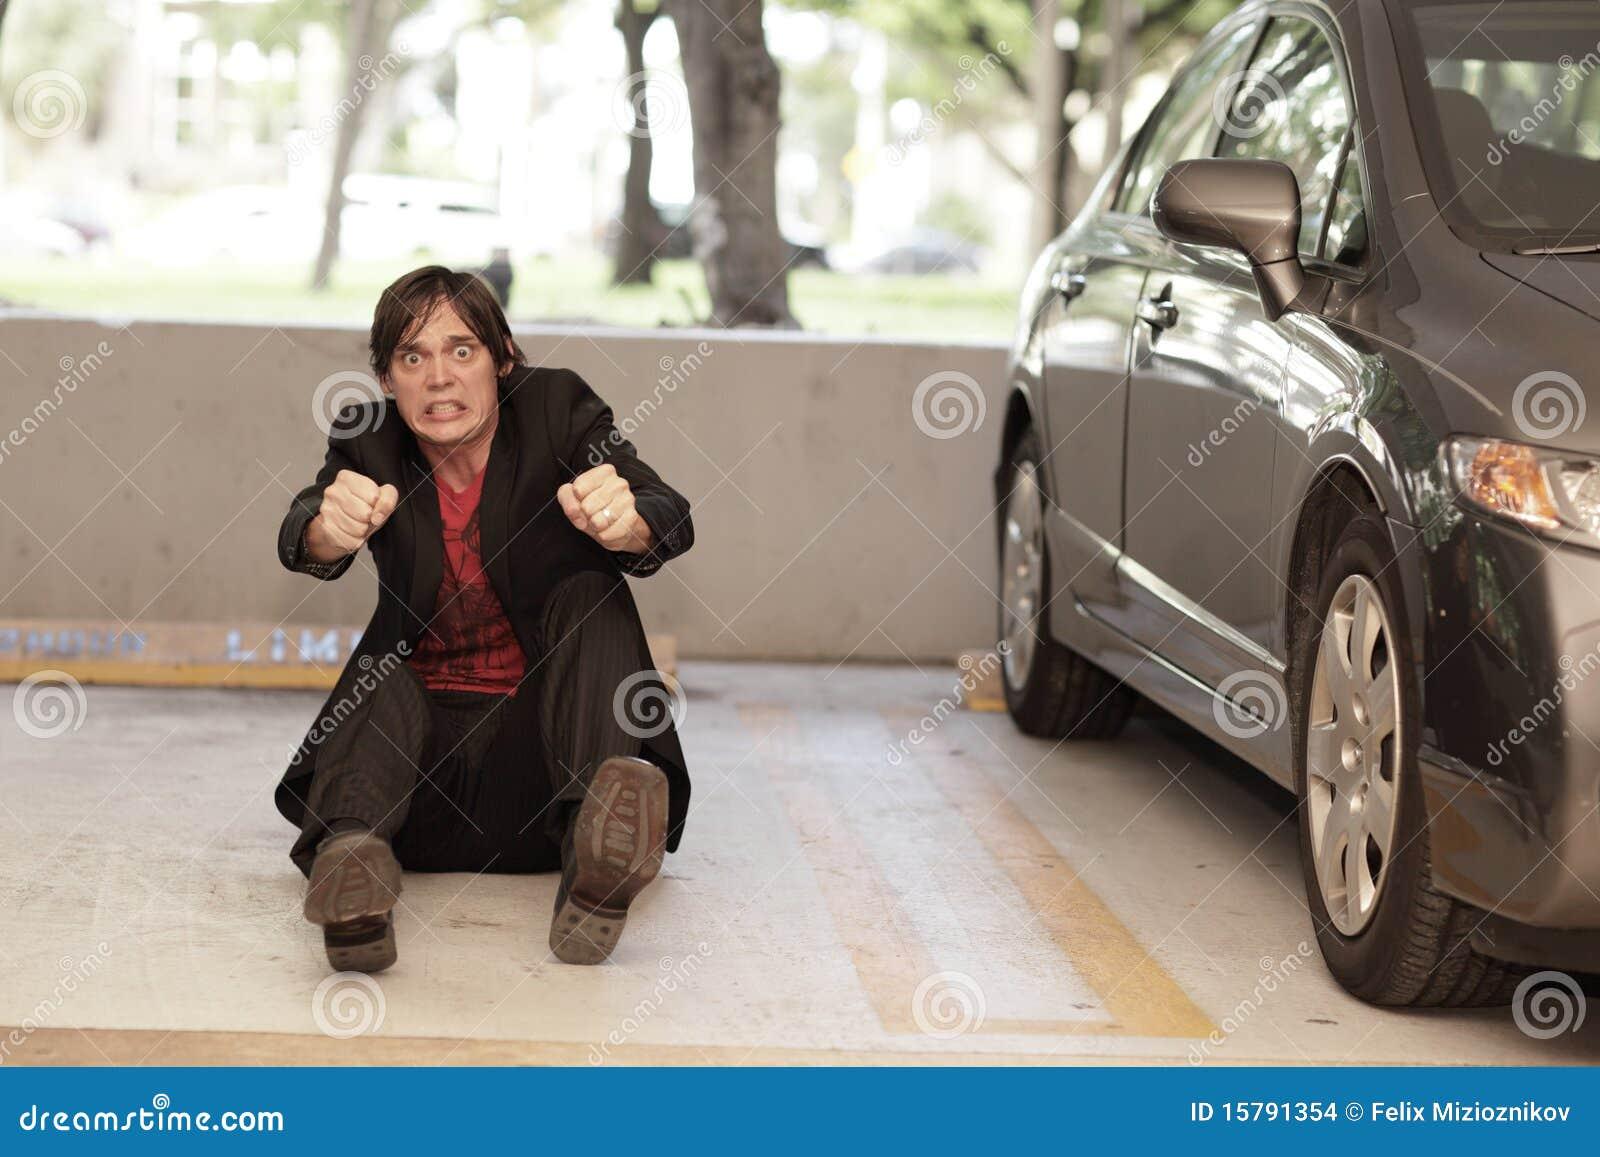 man pretending to drive a car stock photo image 15791354. Black Bedroom Furniture Sets. Home Design Ideas